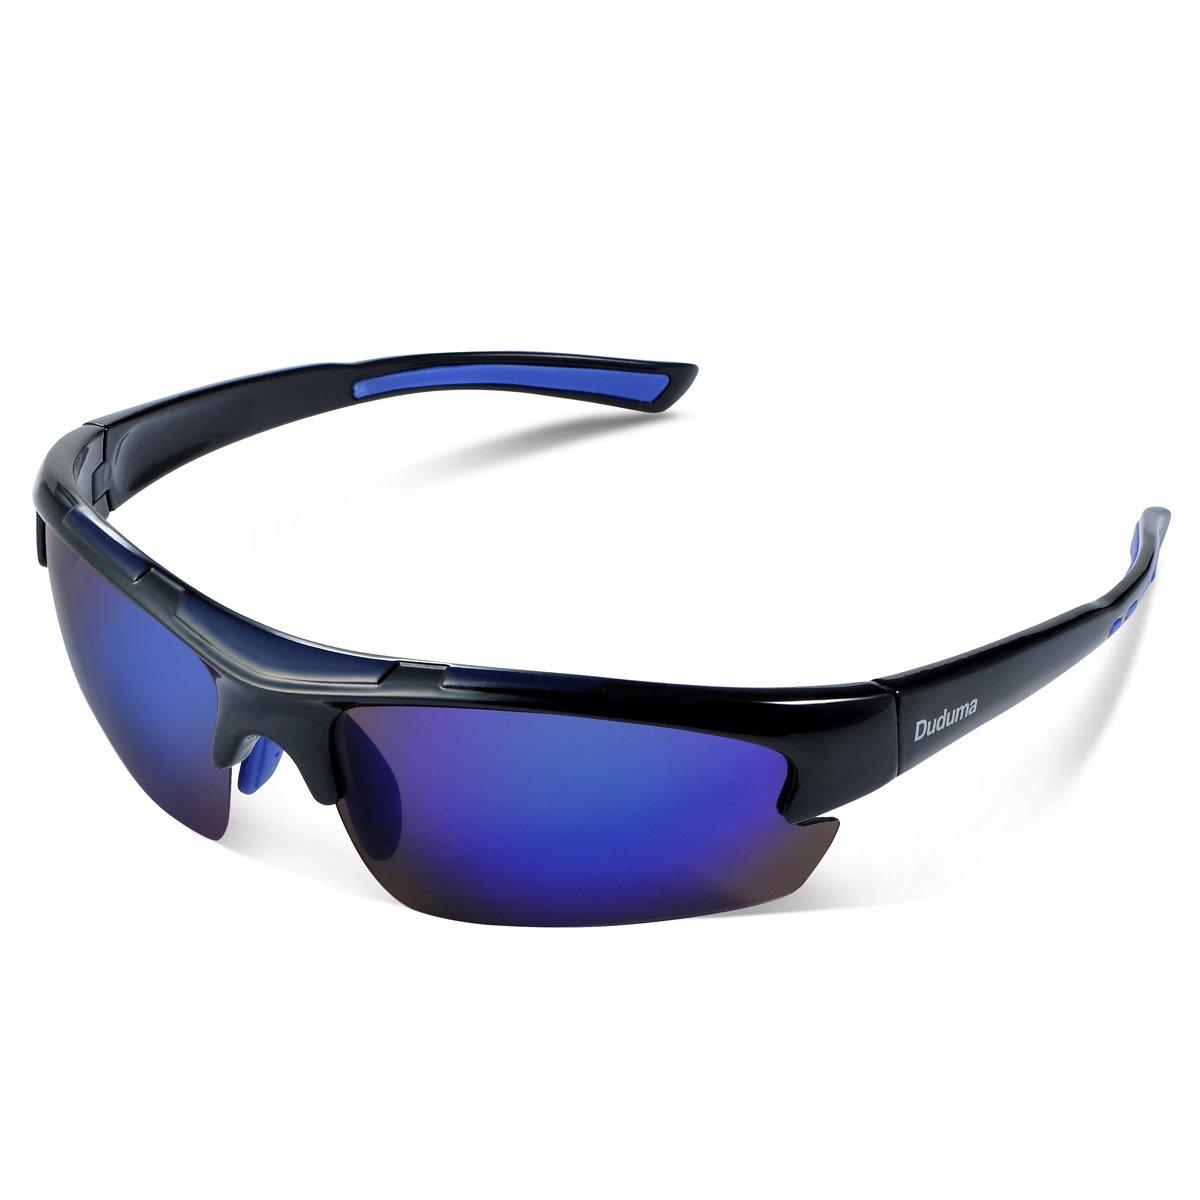 Duduma Polarized Designer Fashion Sports Sunglasses for Baseball Cycling Fishing Golf Tr62 Superlight Frame (black/blue)